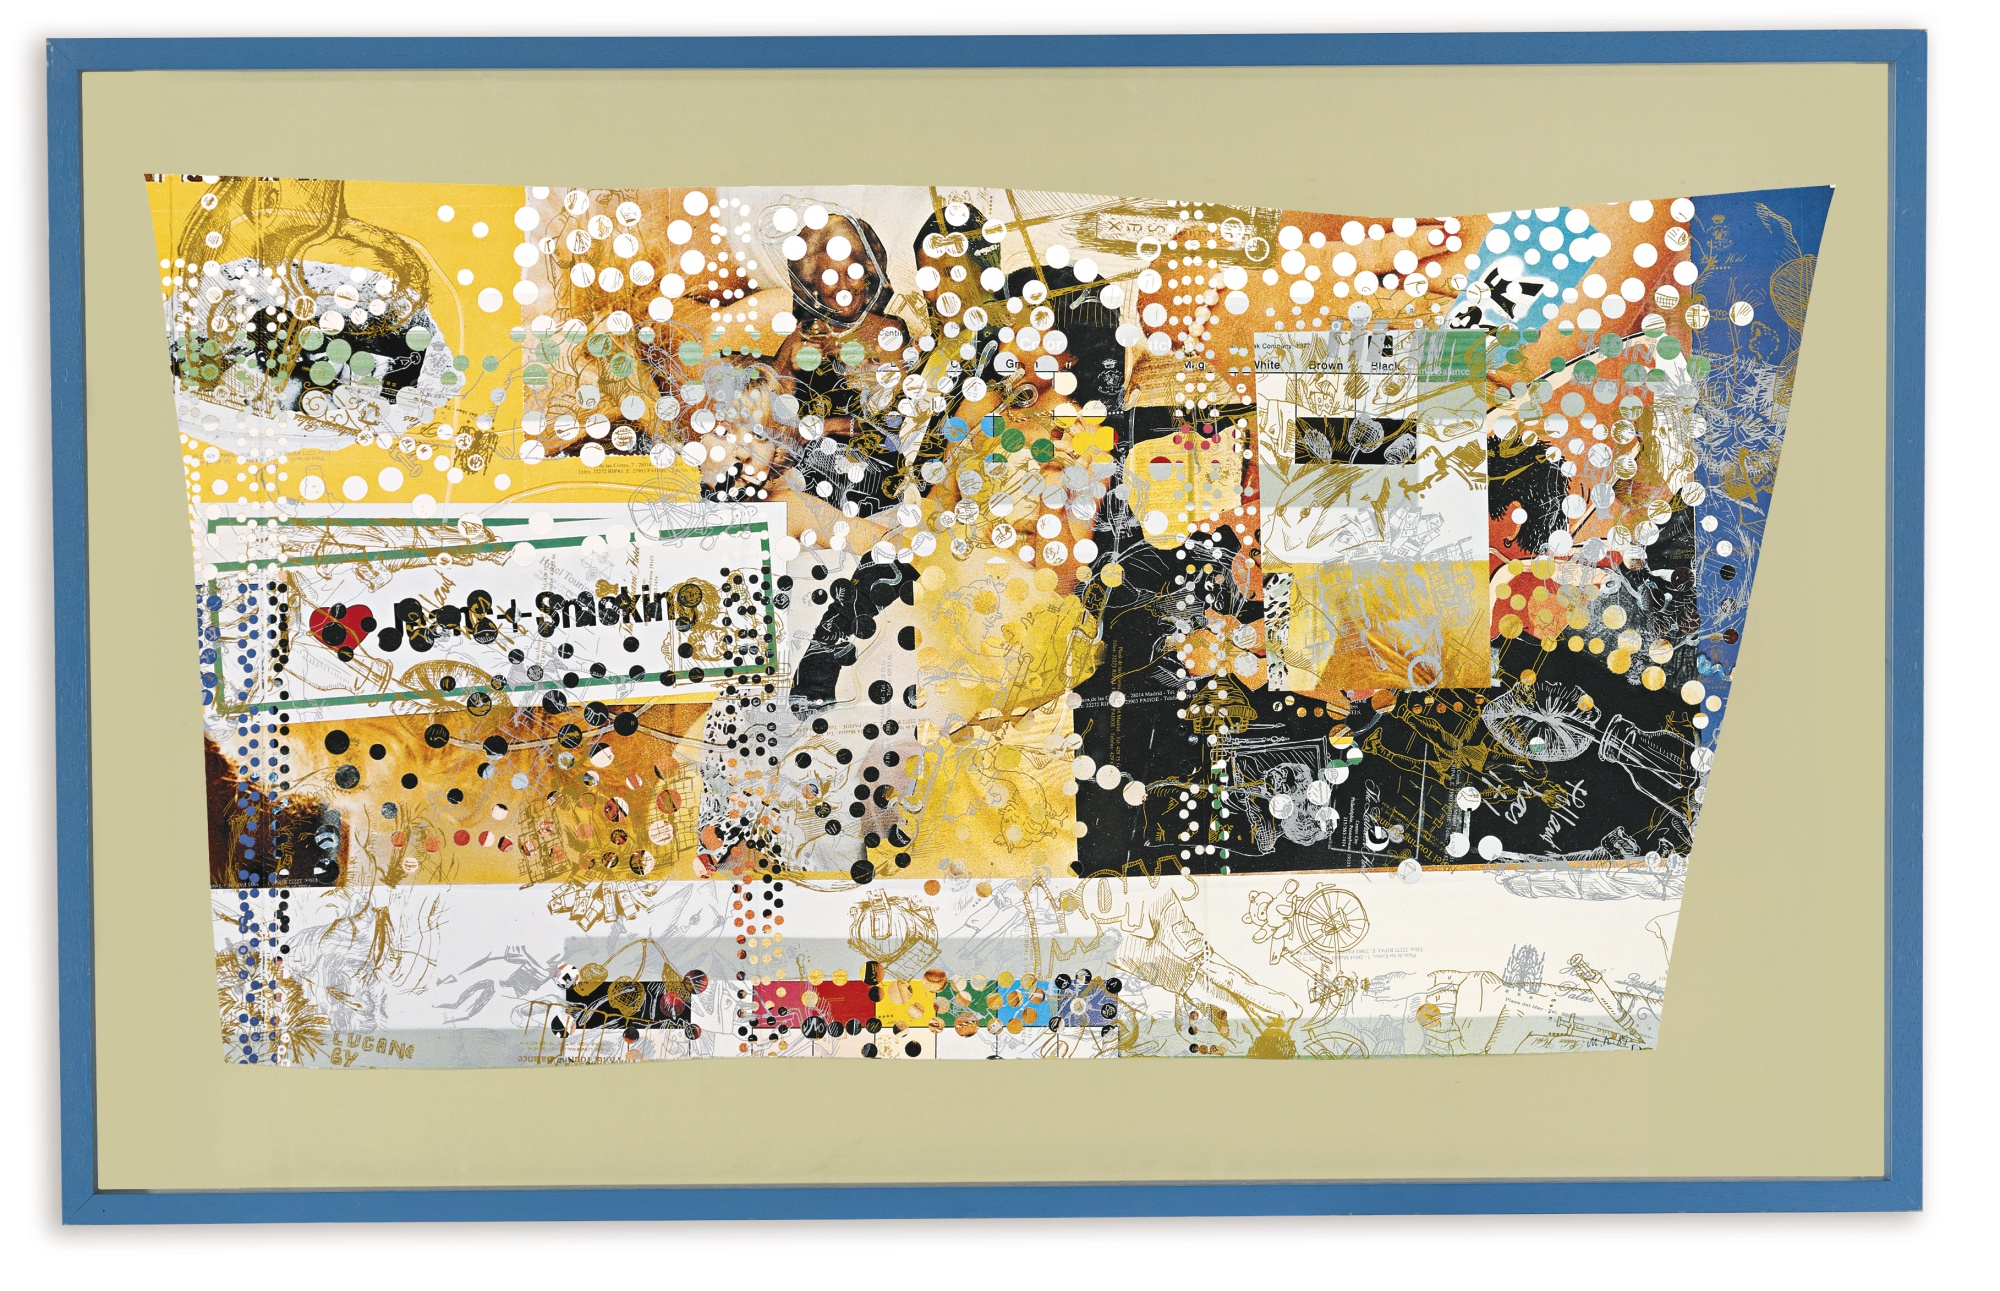 Martin Kippenberger-Untitled (Jeans & Smoking)-1989